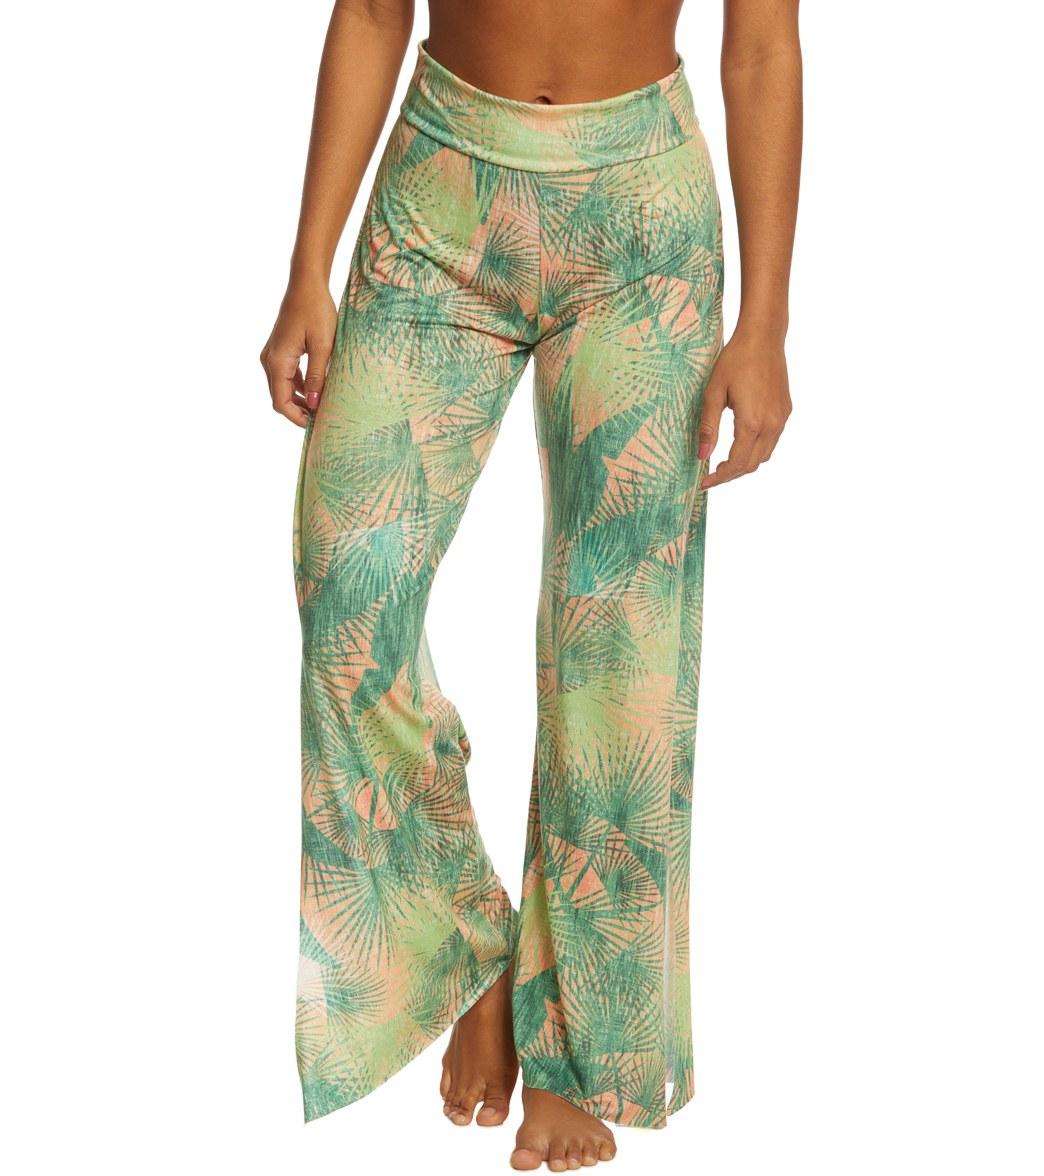 886edd4c10 Onzie Pura Vida Yoga Flare Pants at YogaOutlet.com - Free Shipping